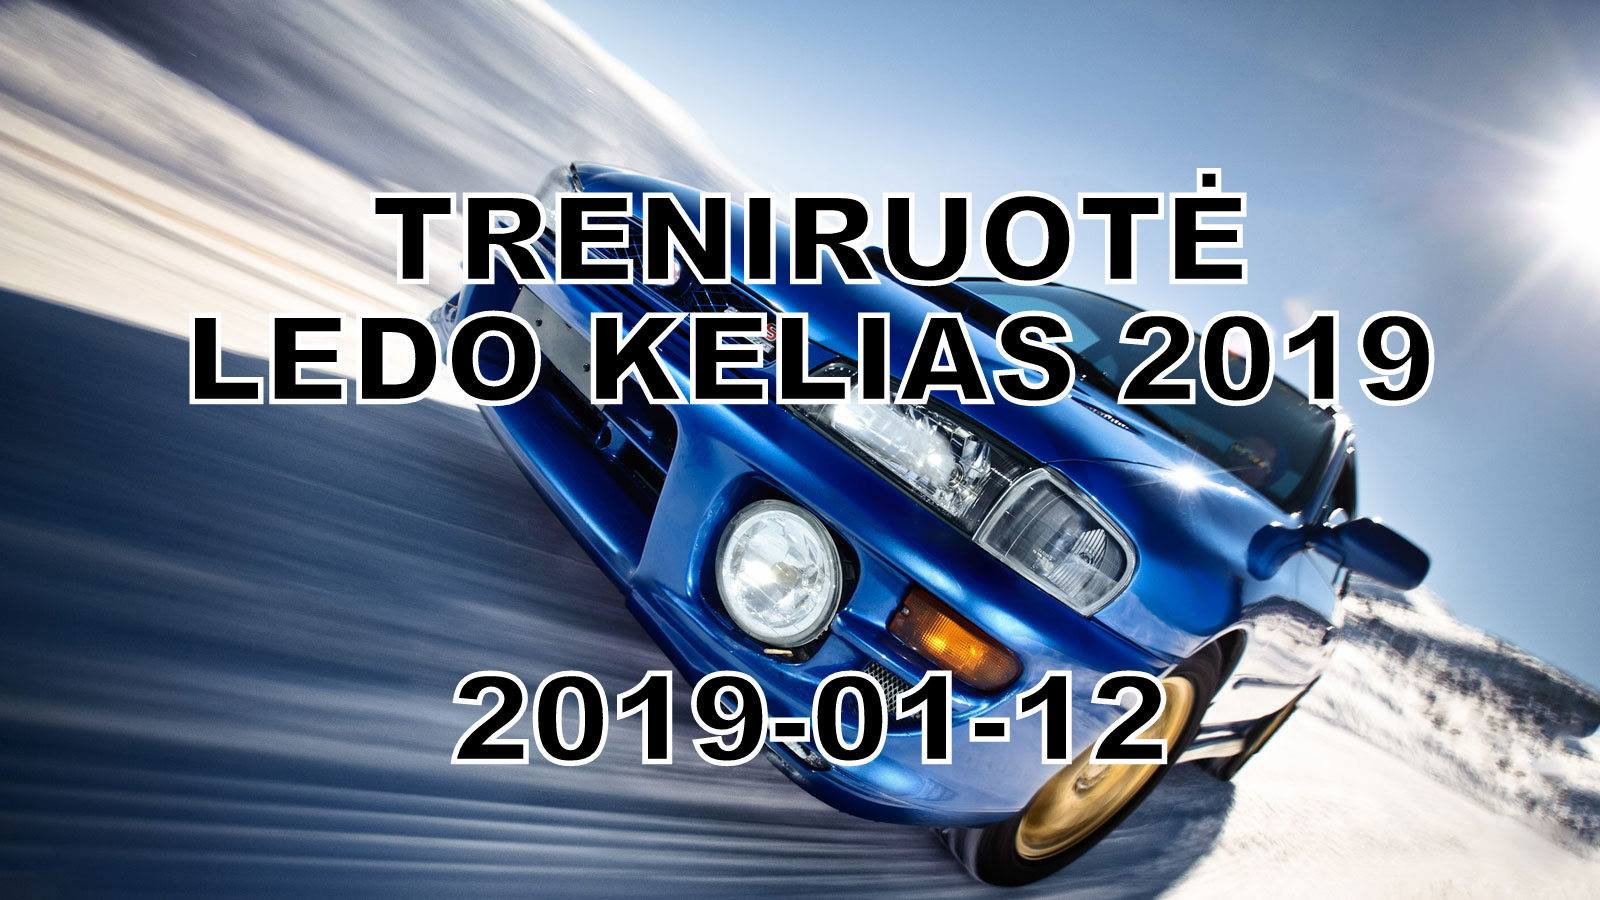 Ledo kelias 2019